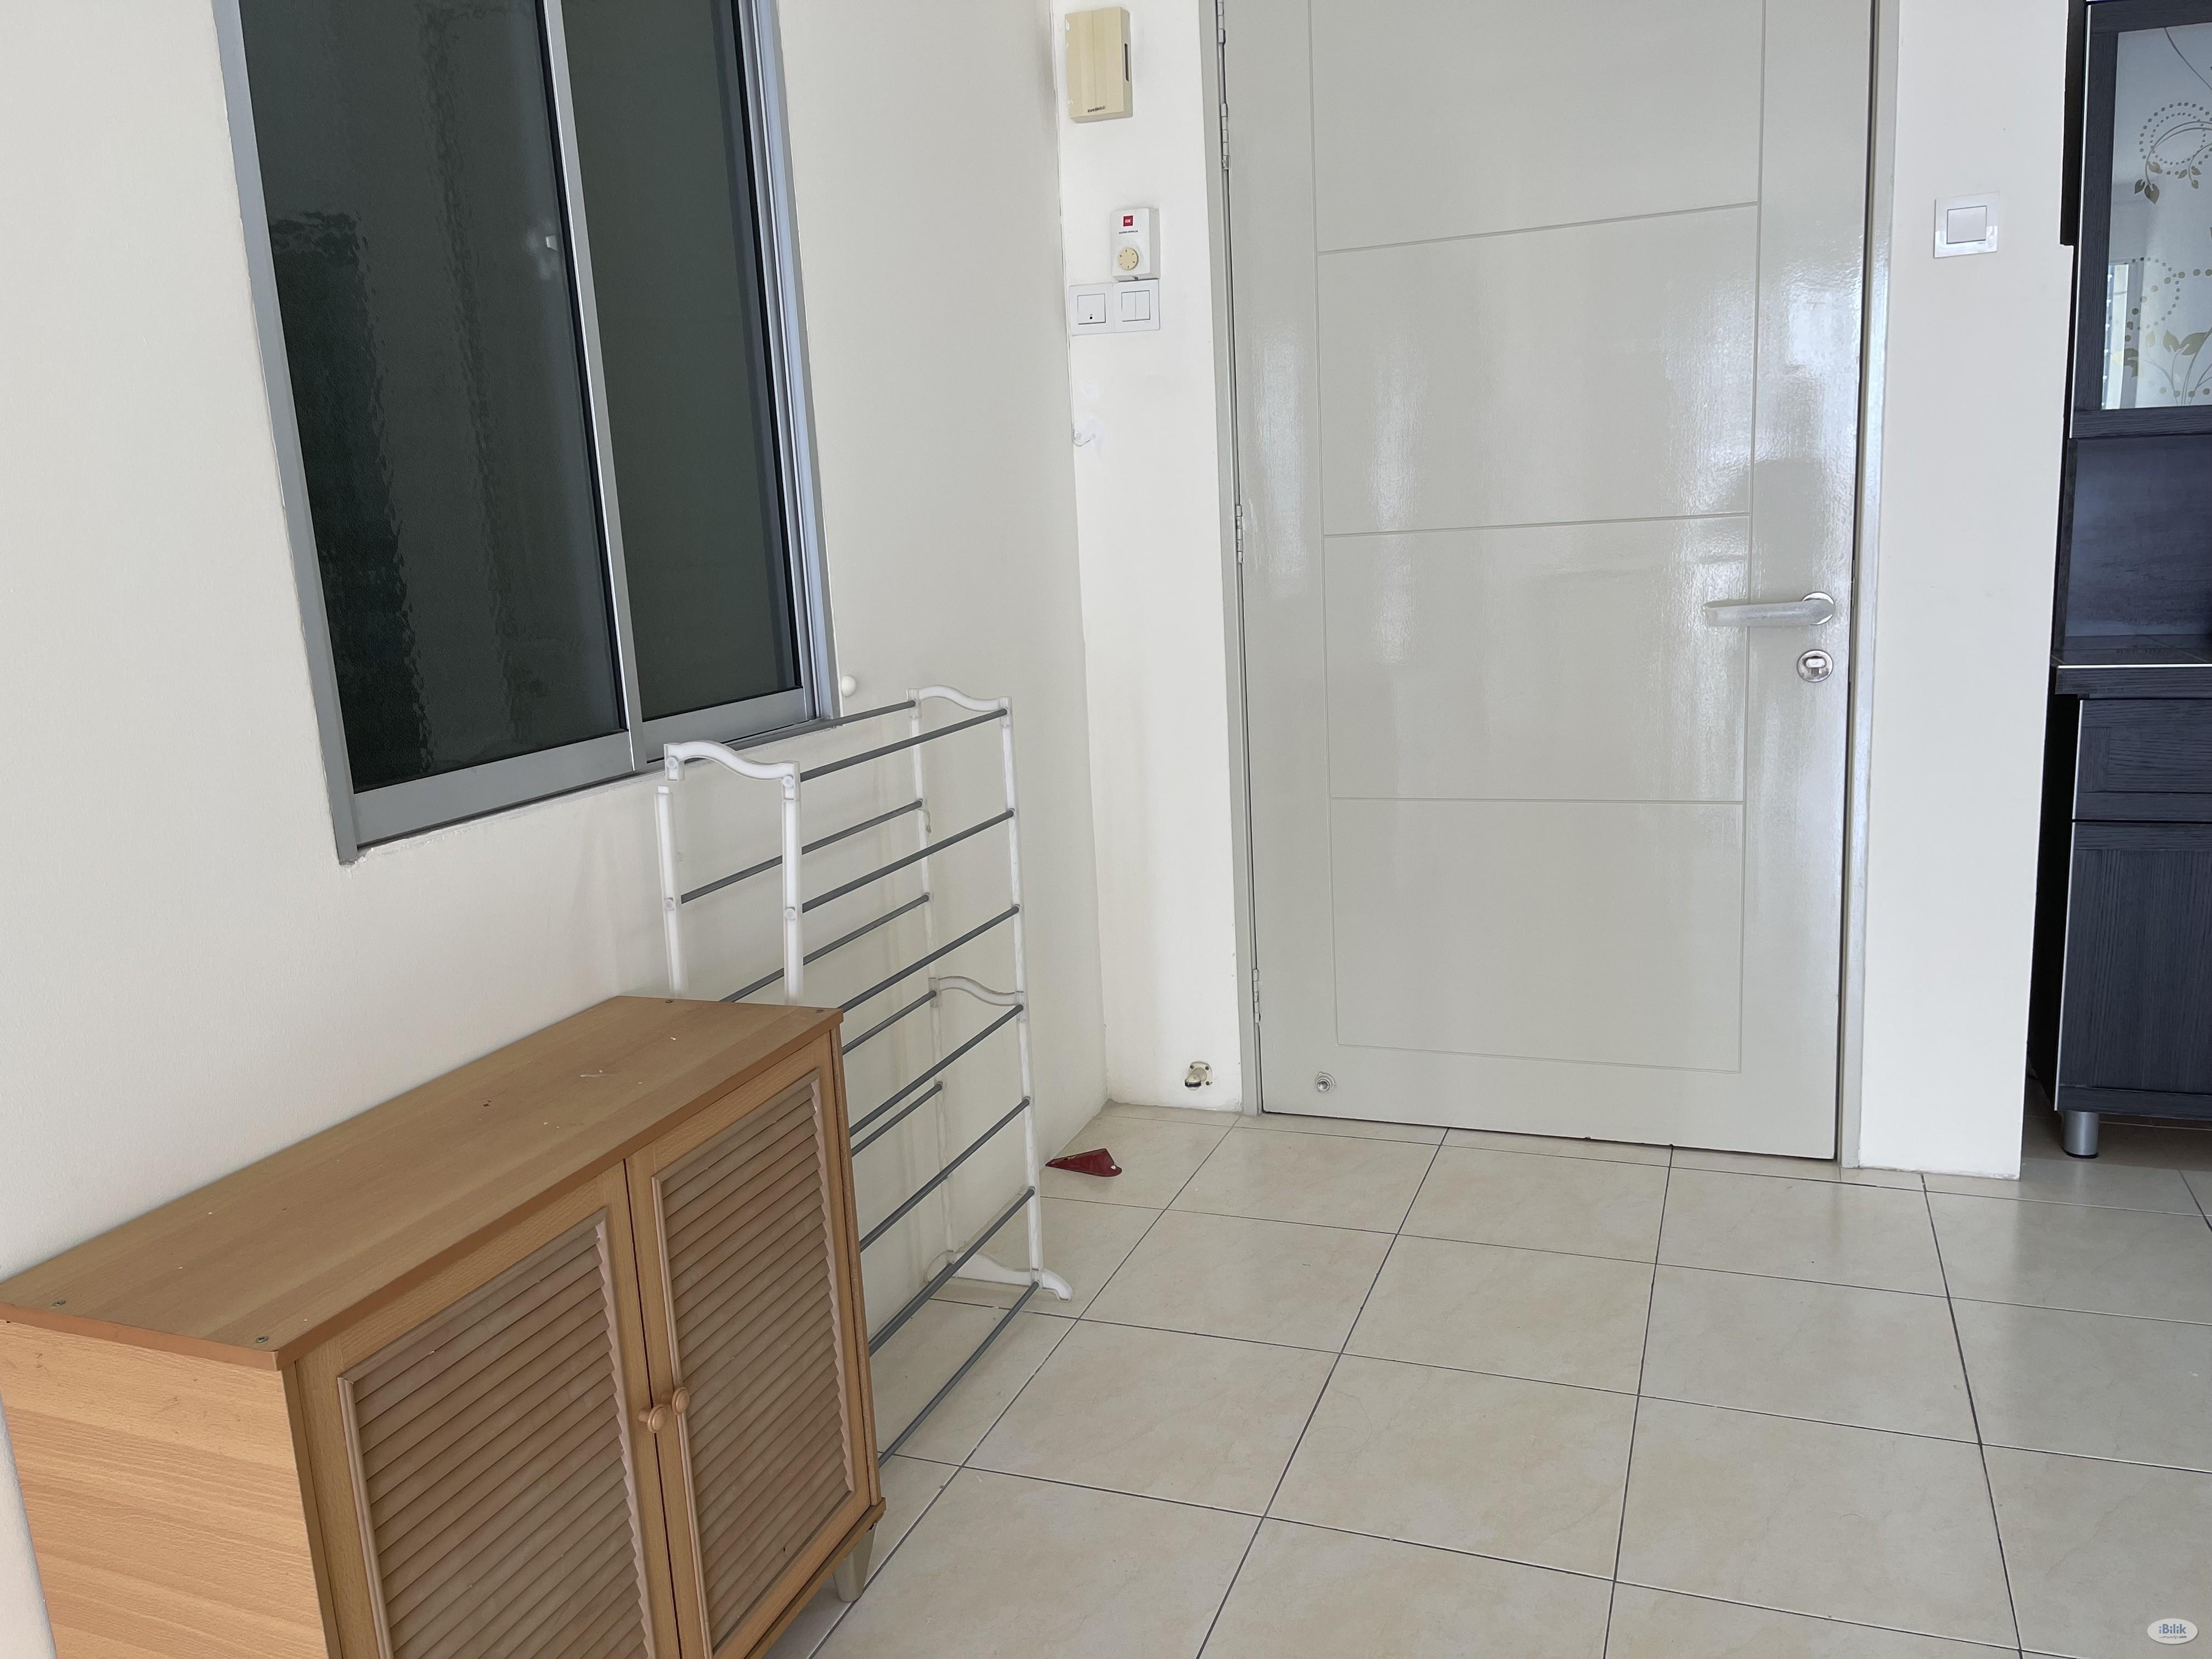 PV13 Condominium Block A Middle room with partial furnished TARUC University Lrt Wangsa Maju Setapak PV128